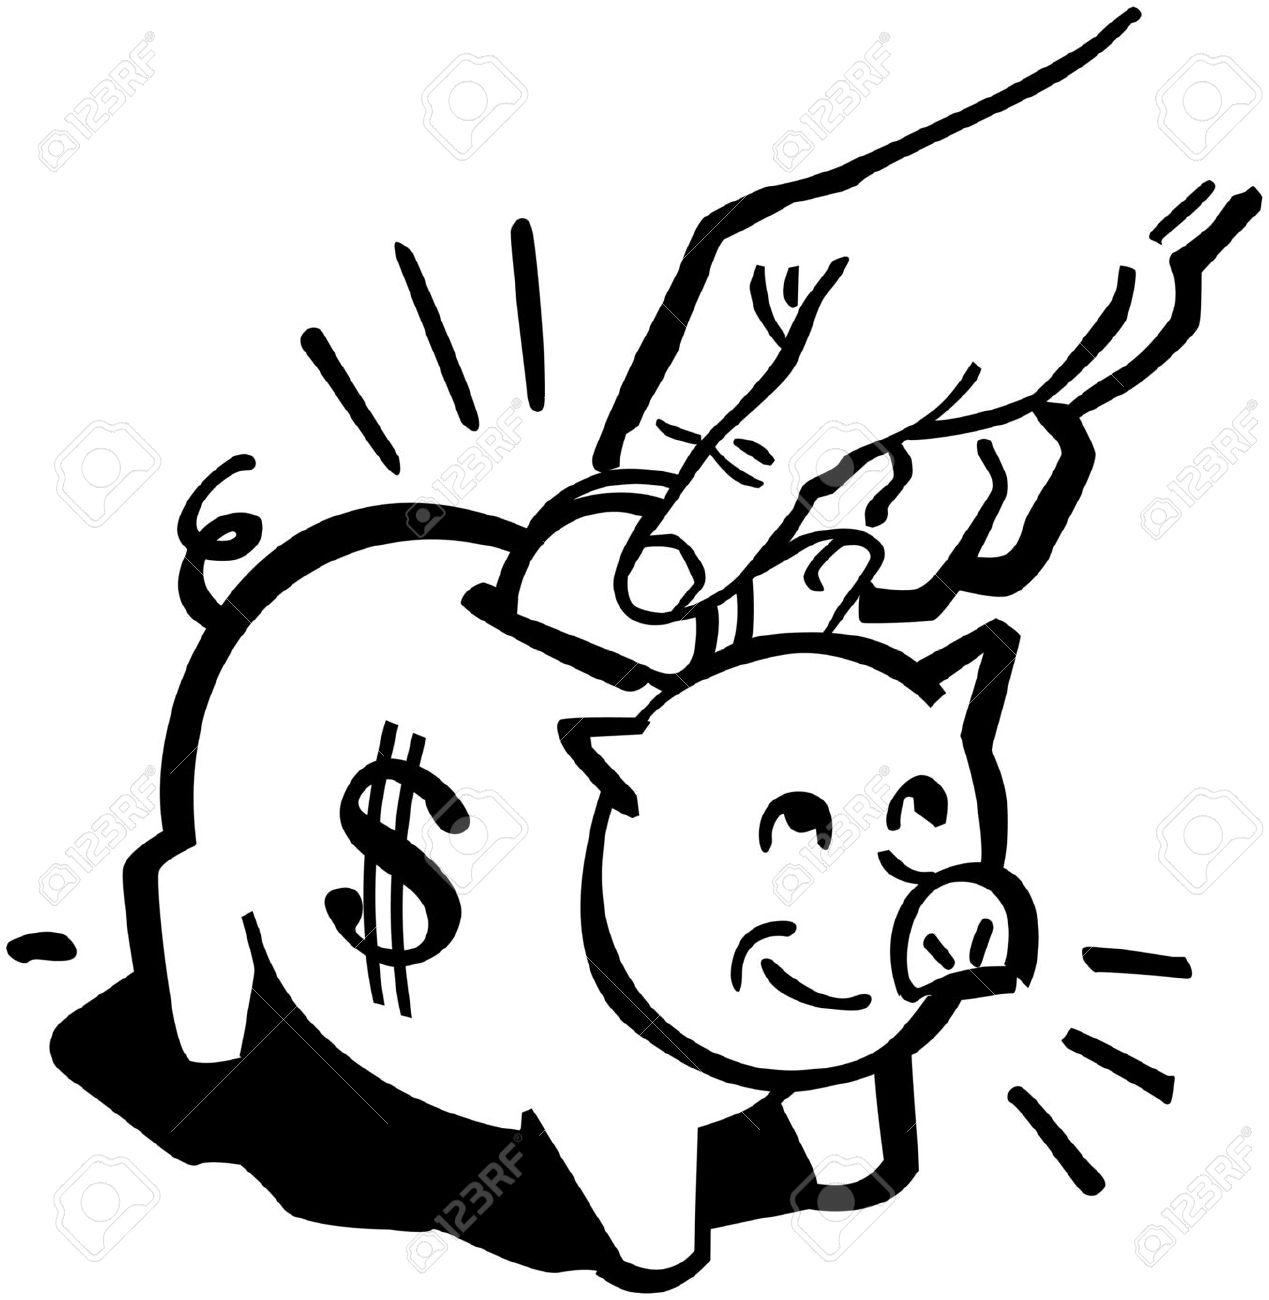 Bank Head Clipart